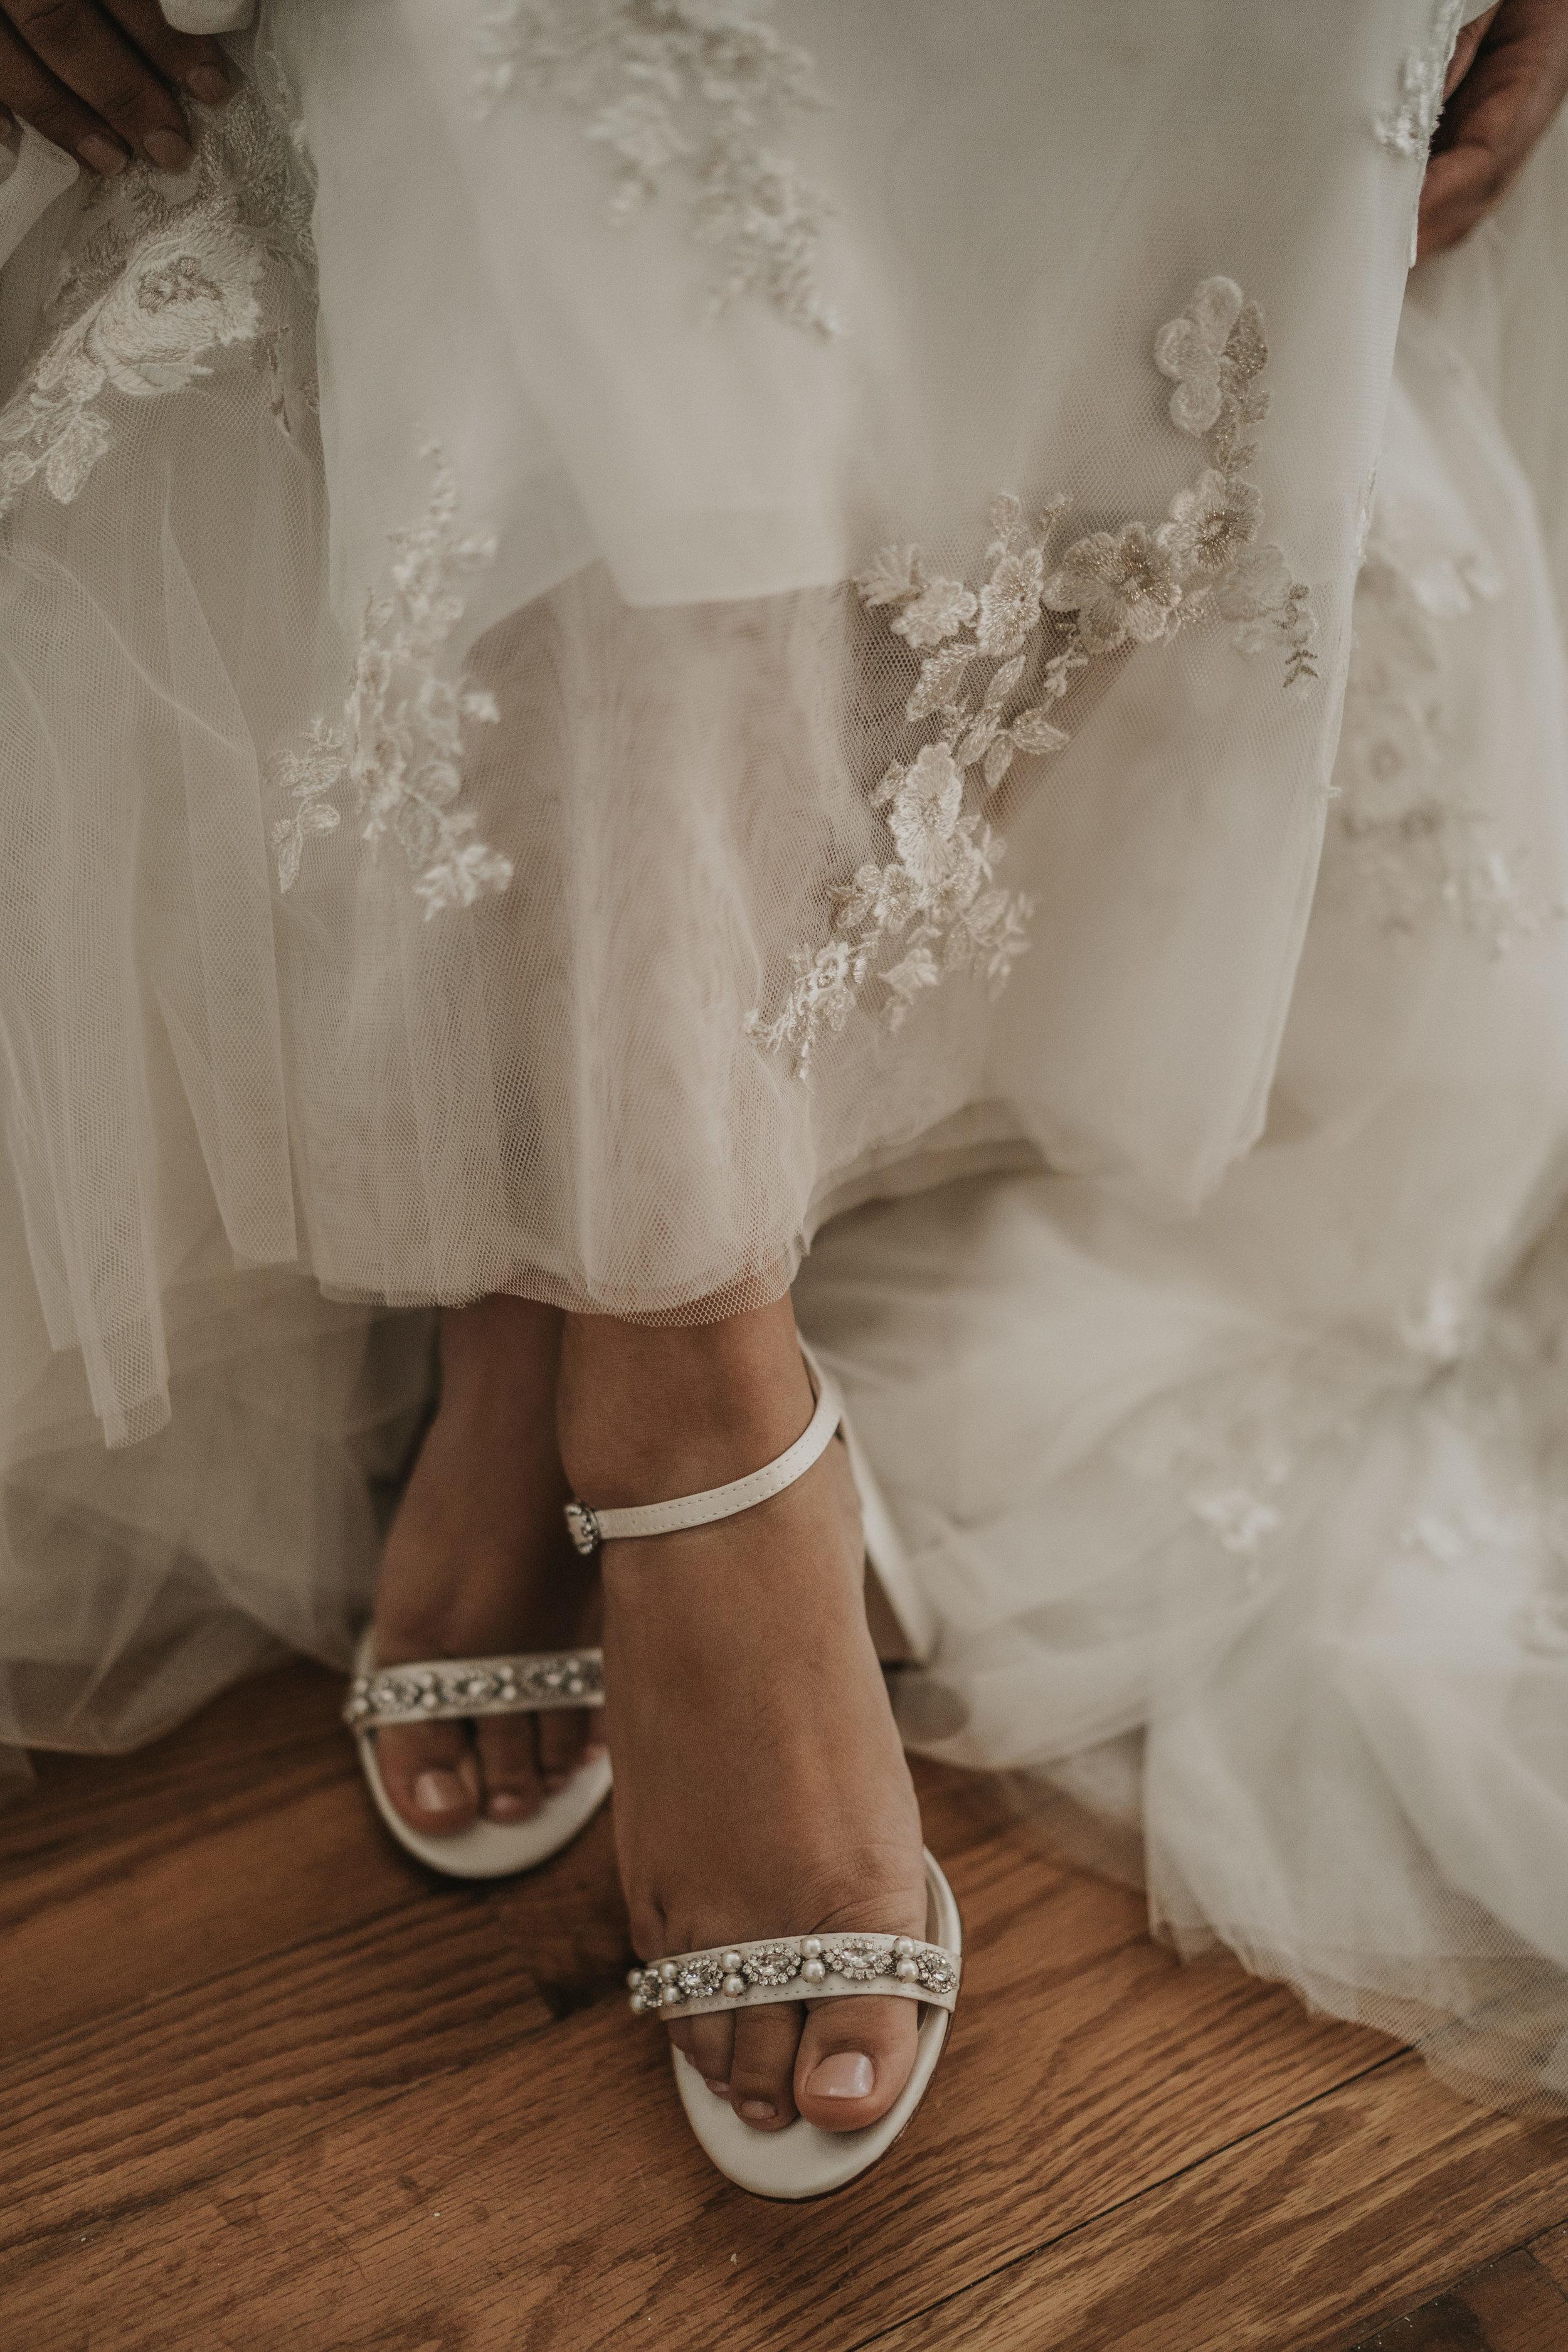 193MICHI&GABEWEDDINGDAY(WeddingFinal).jpg